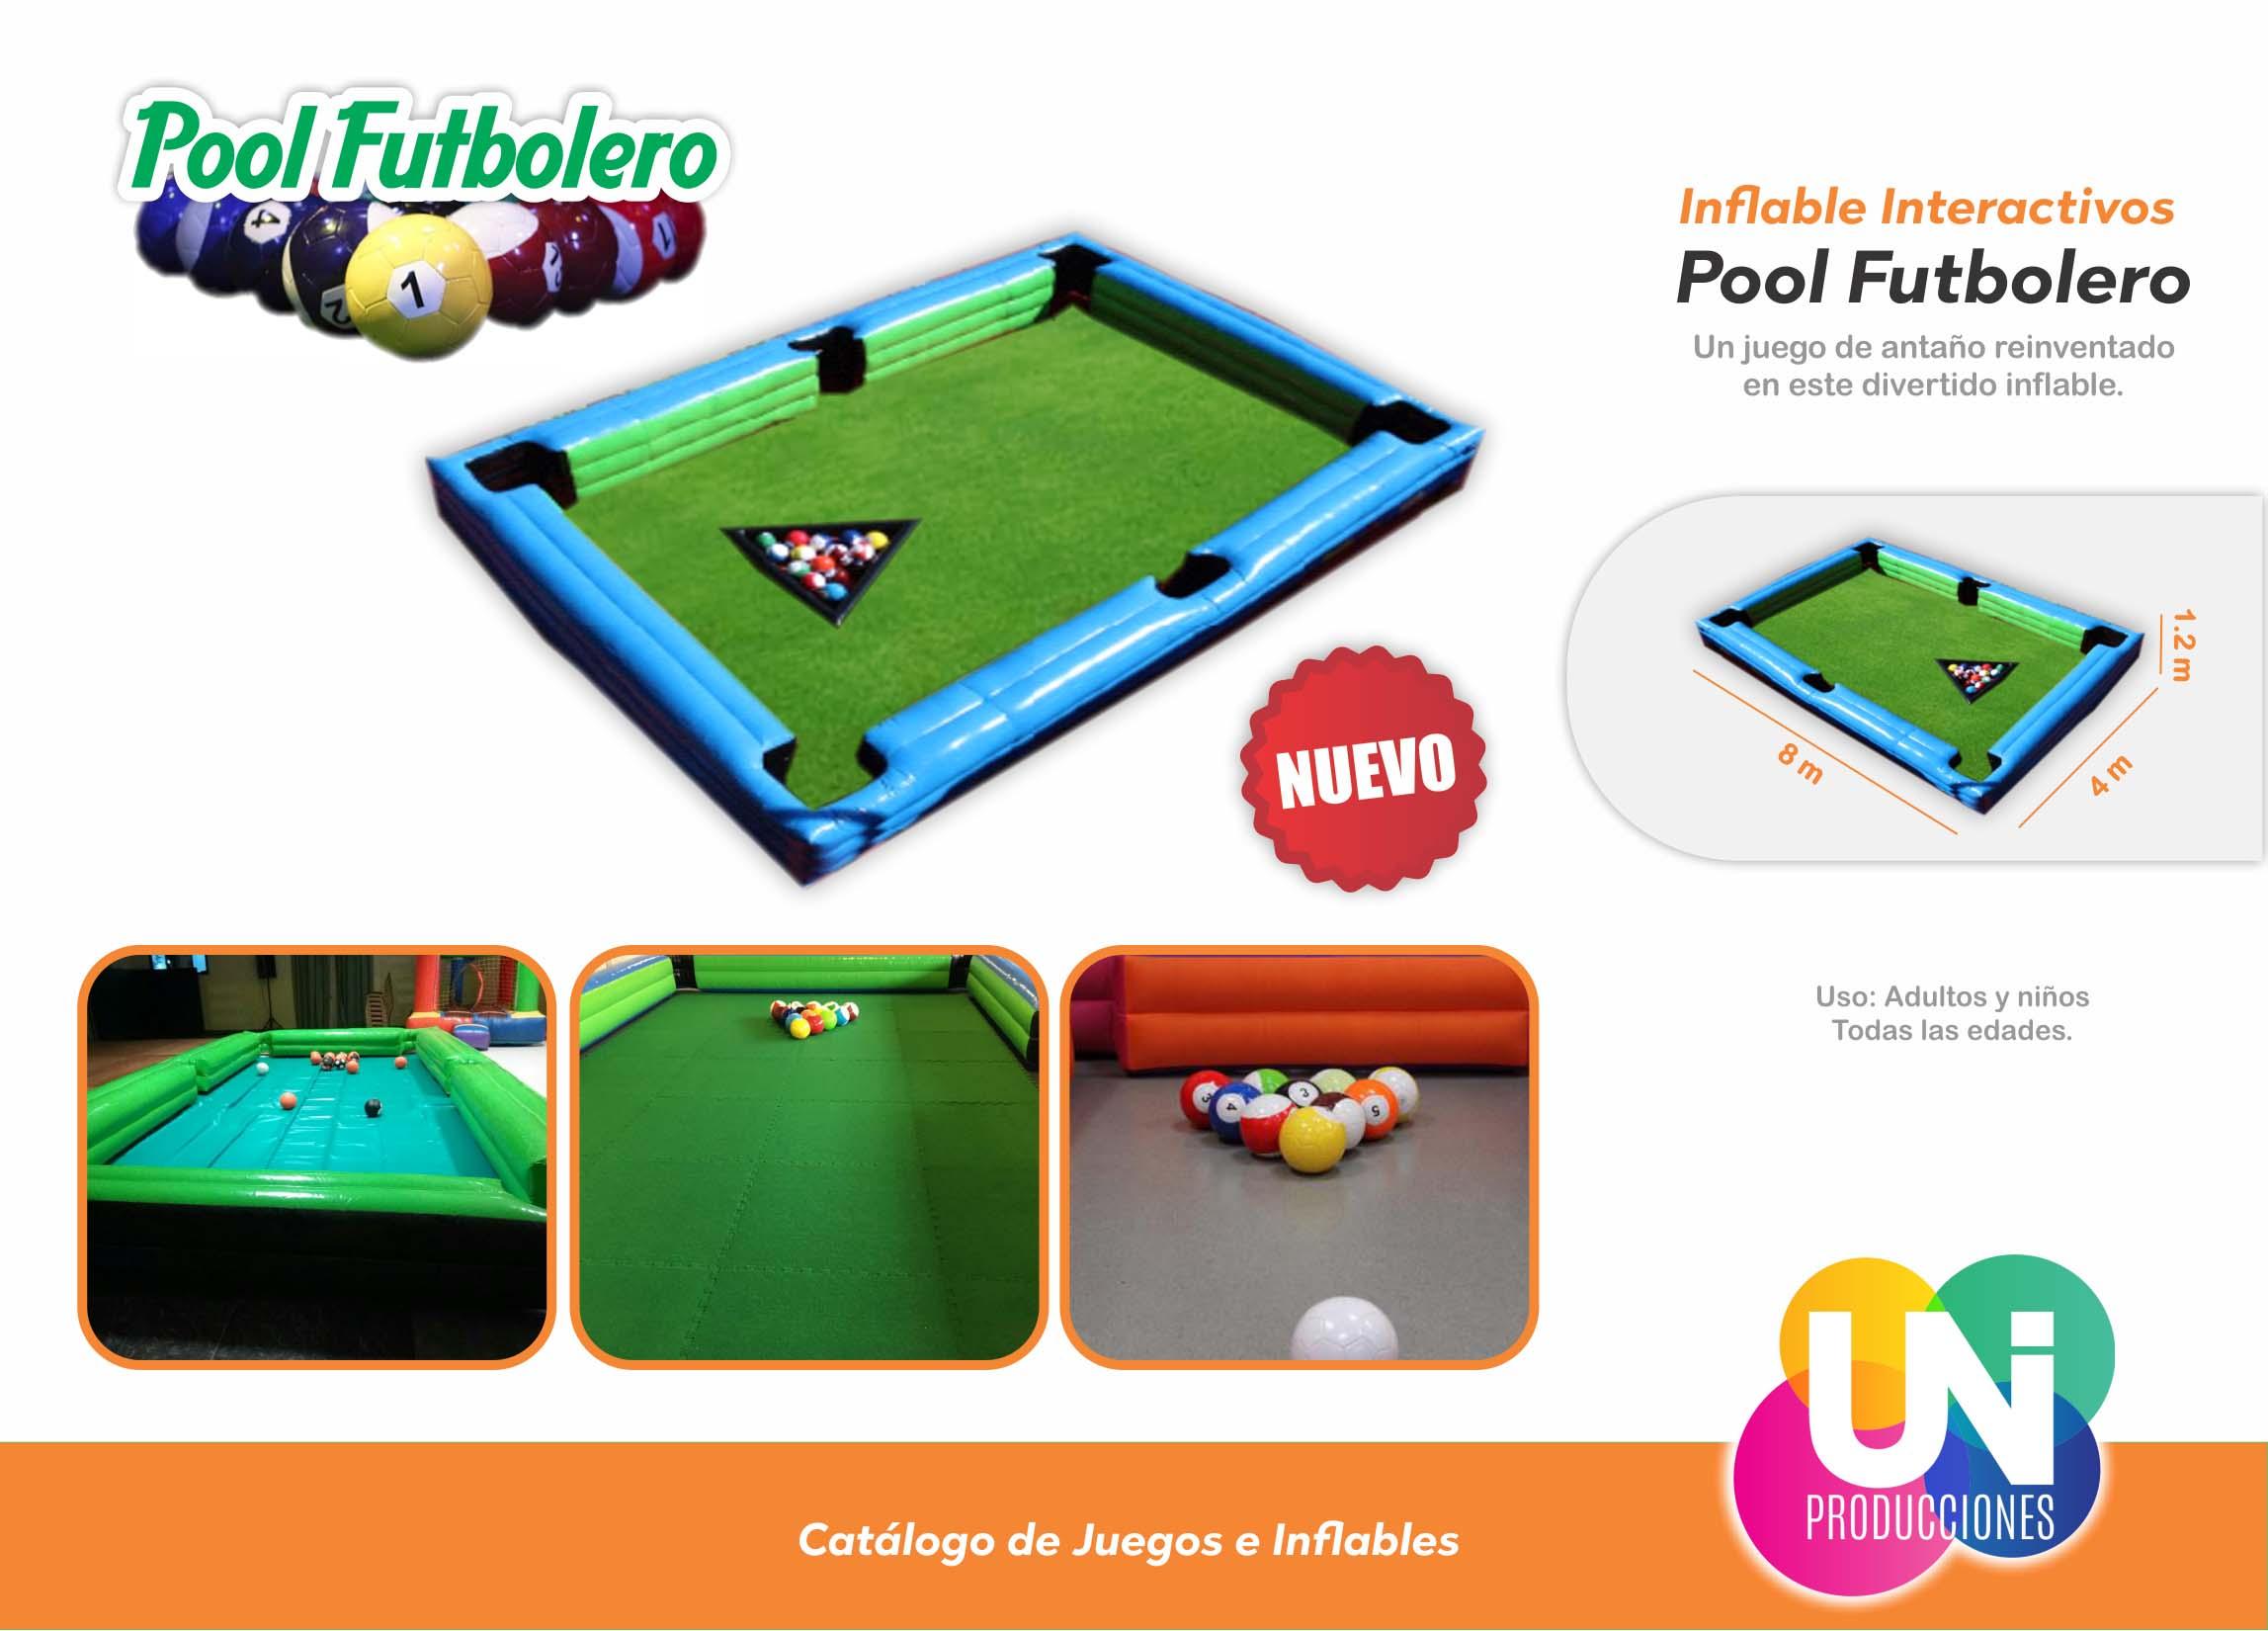 Pool Futbolero